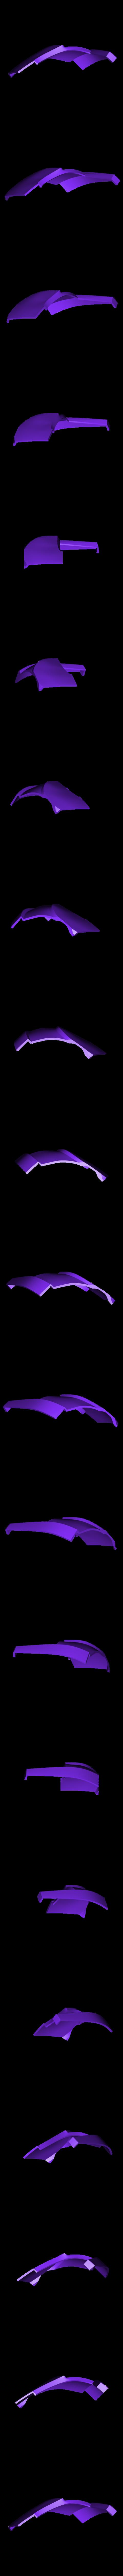 Part_4_v2.stl Download free STL file Senate Guard Helmet (Star Wars) • 3D printer design, VillainousPropShop